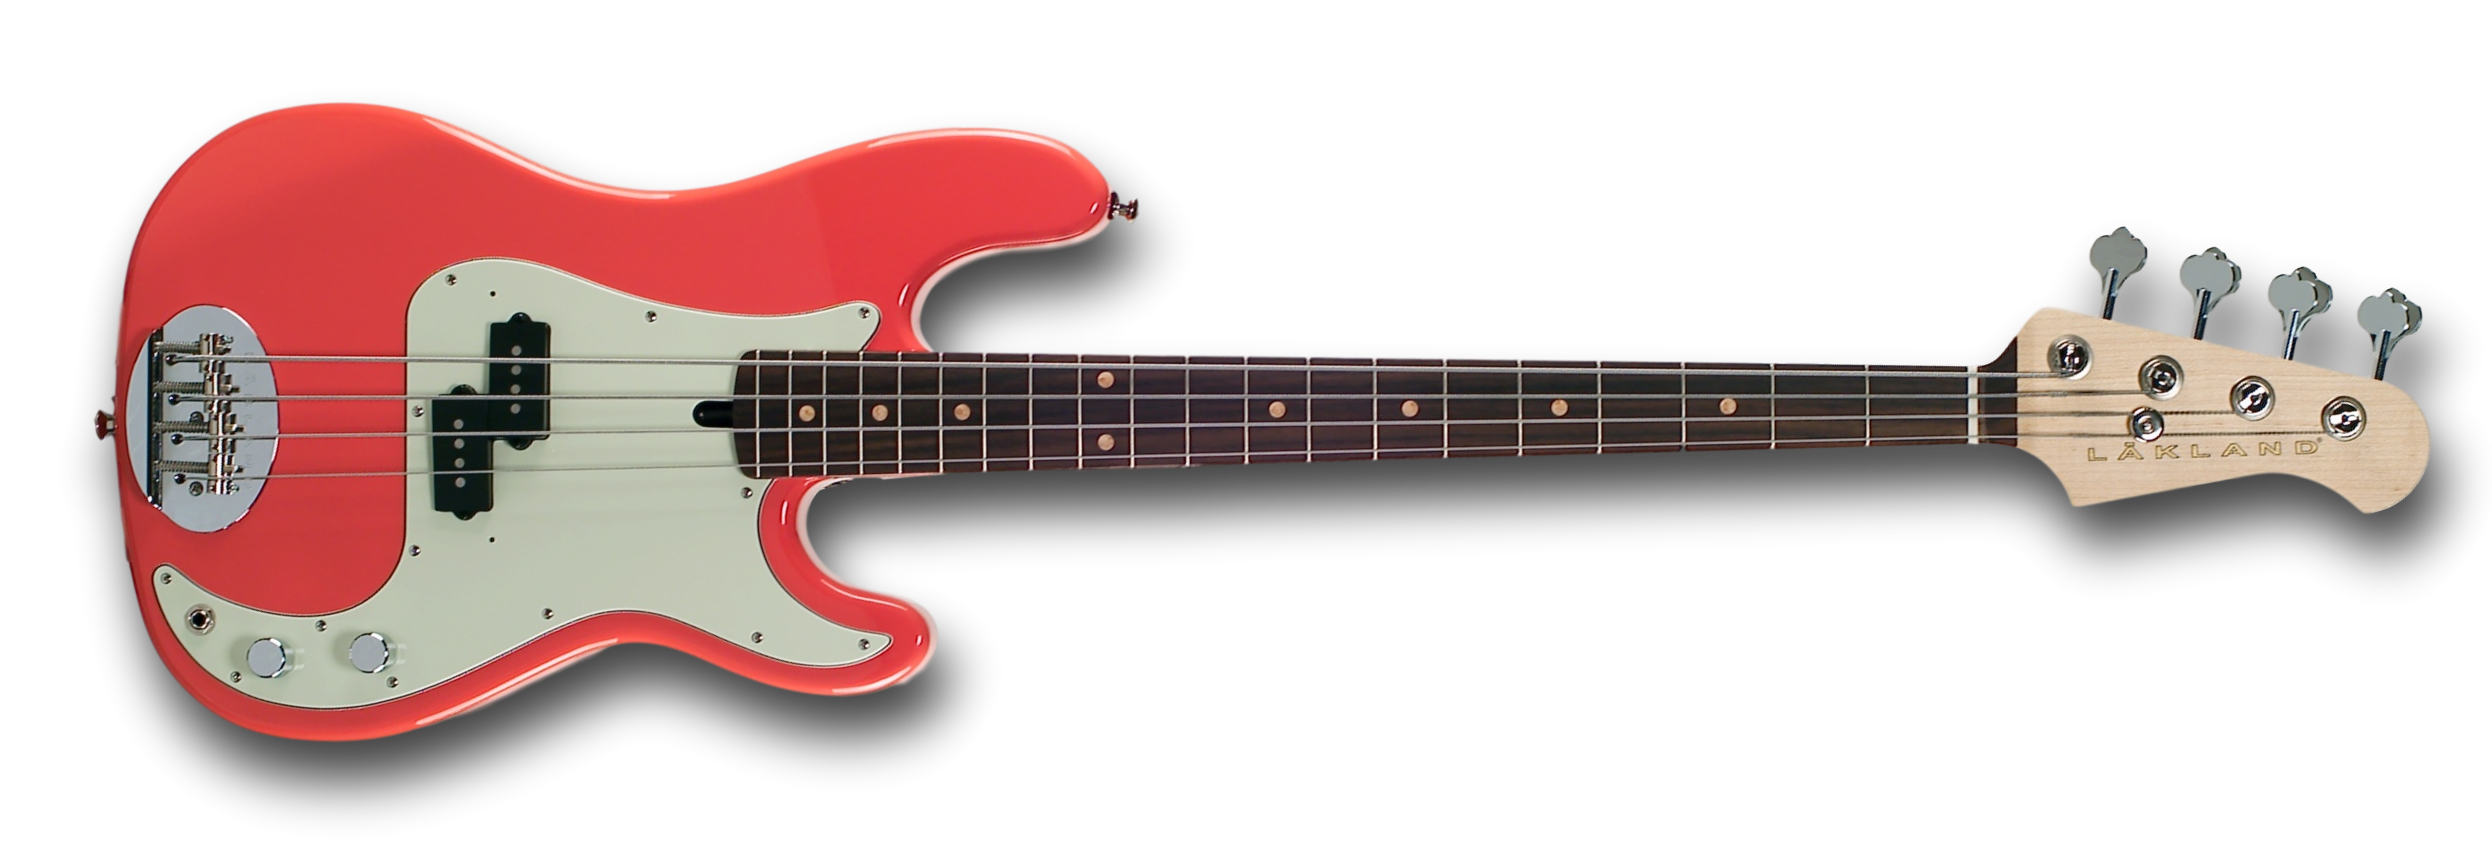 USA Series 44-64 Fiesta Red